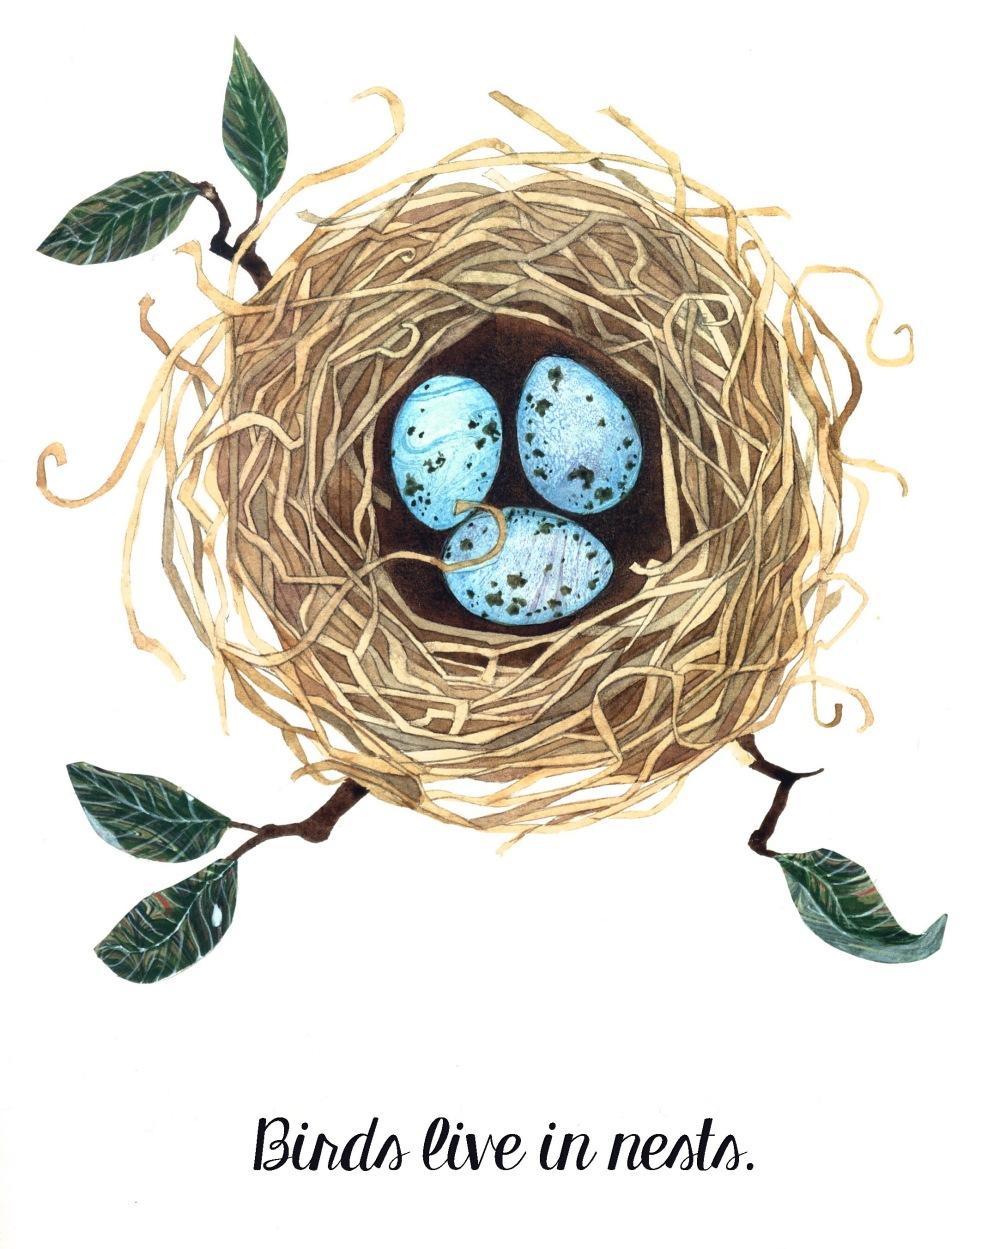 Birds live in nests